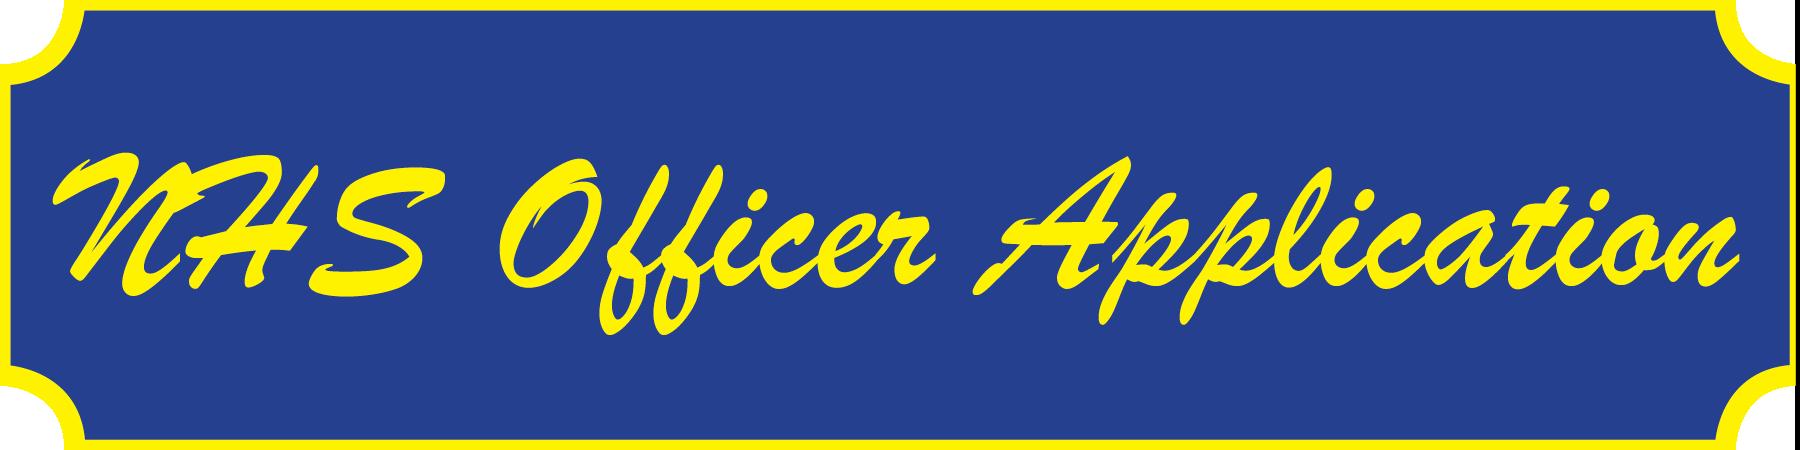 NHS officer application